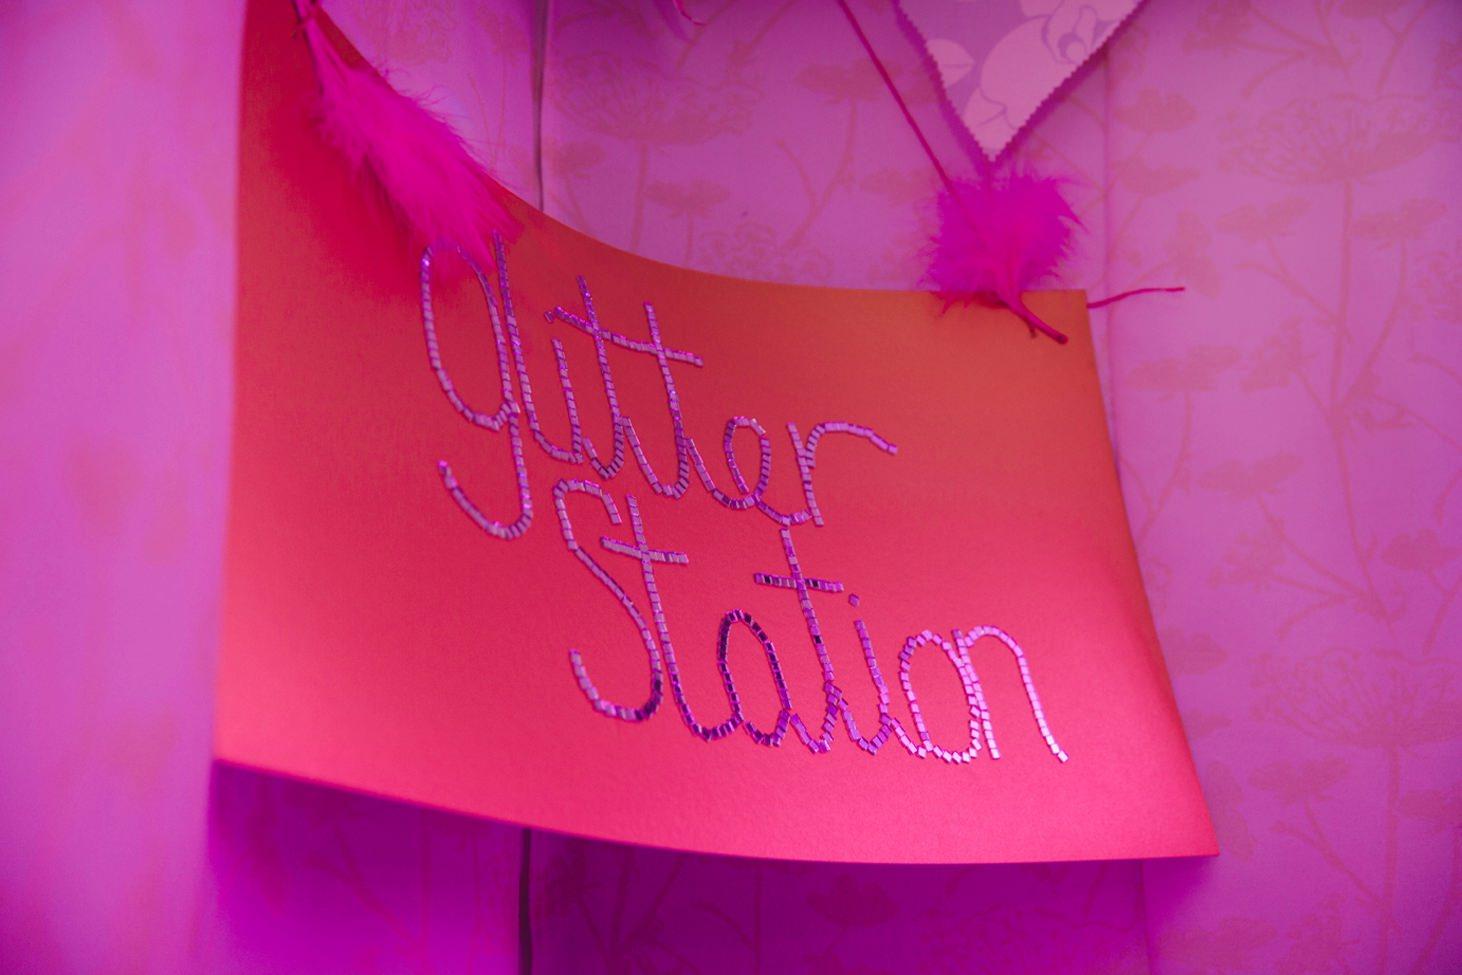 Bodleian library wedding glitter station sign